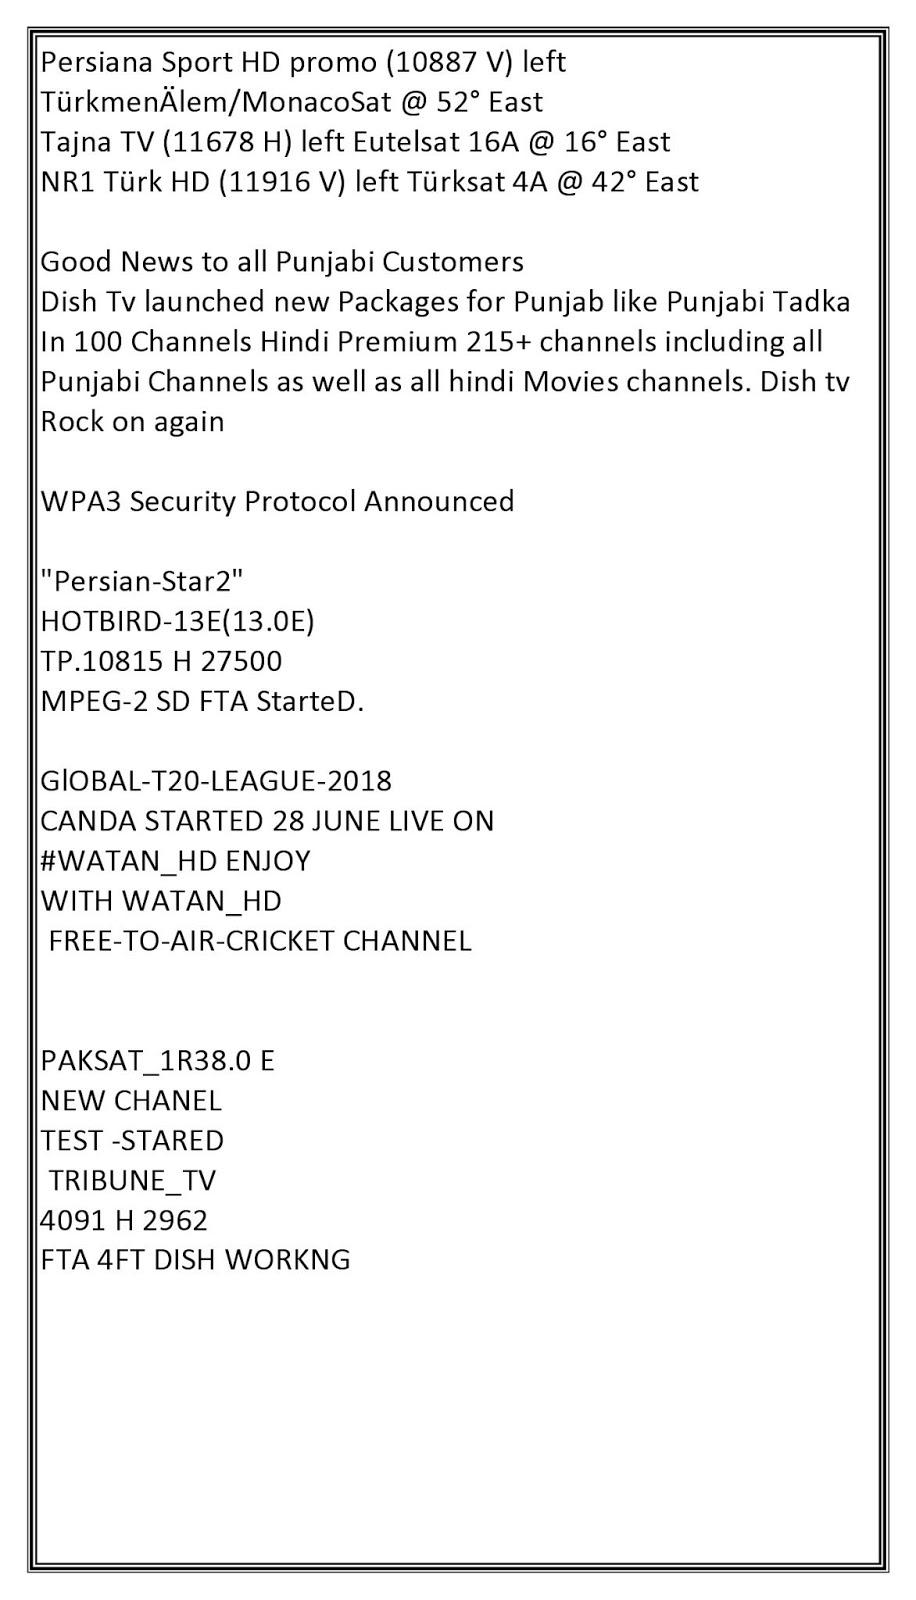 Satellite TV News: Satellite Television News 26-6-18